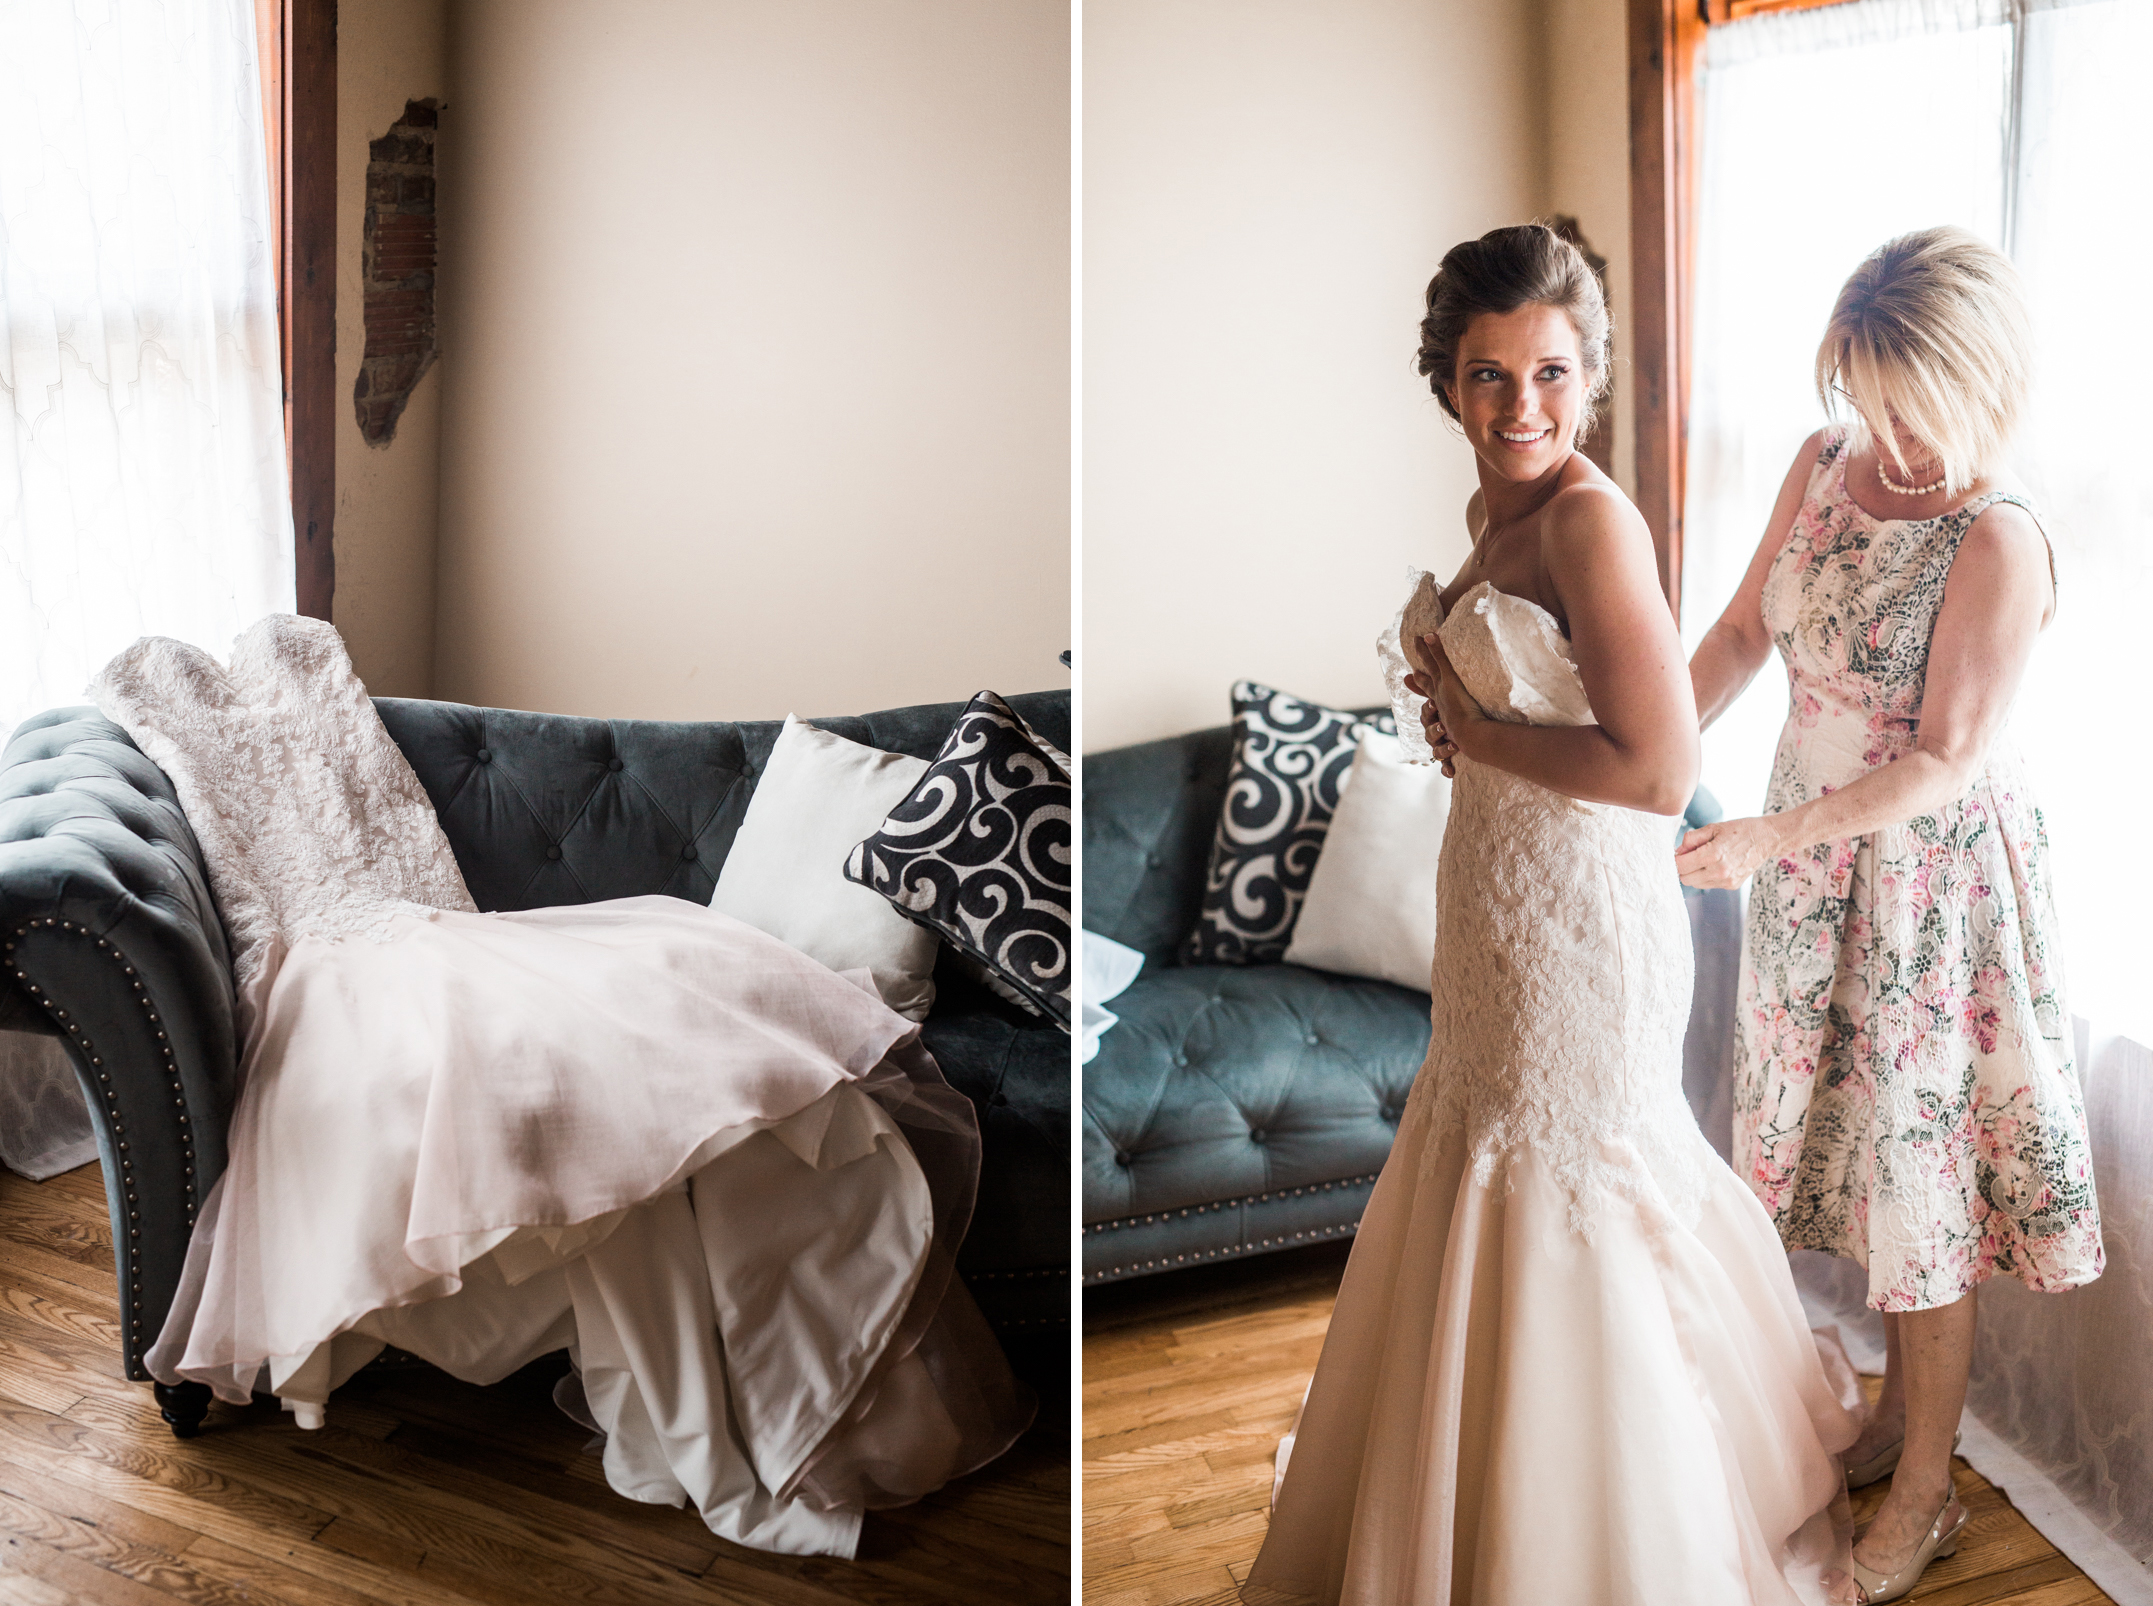 LegacyUnion-Wedding-Photographer-Glendale-CA-115 copy.jpg